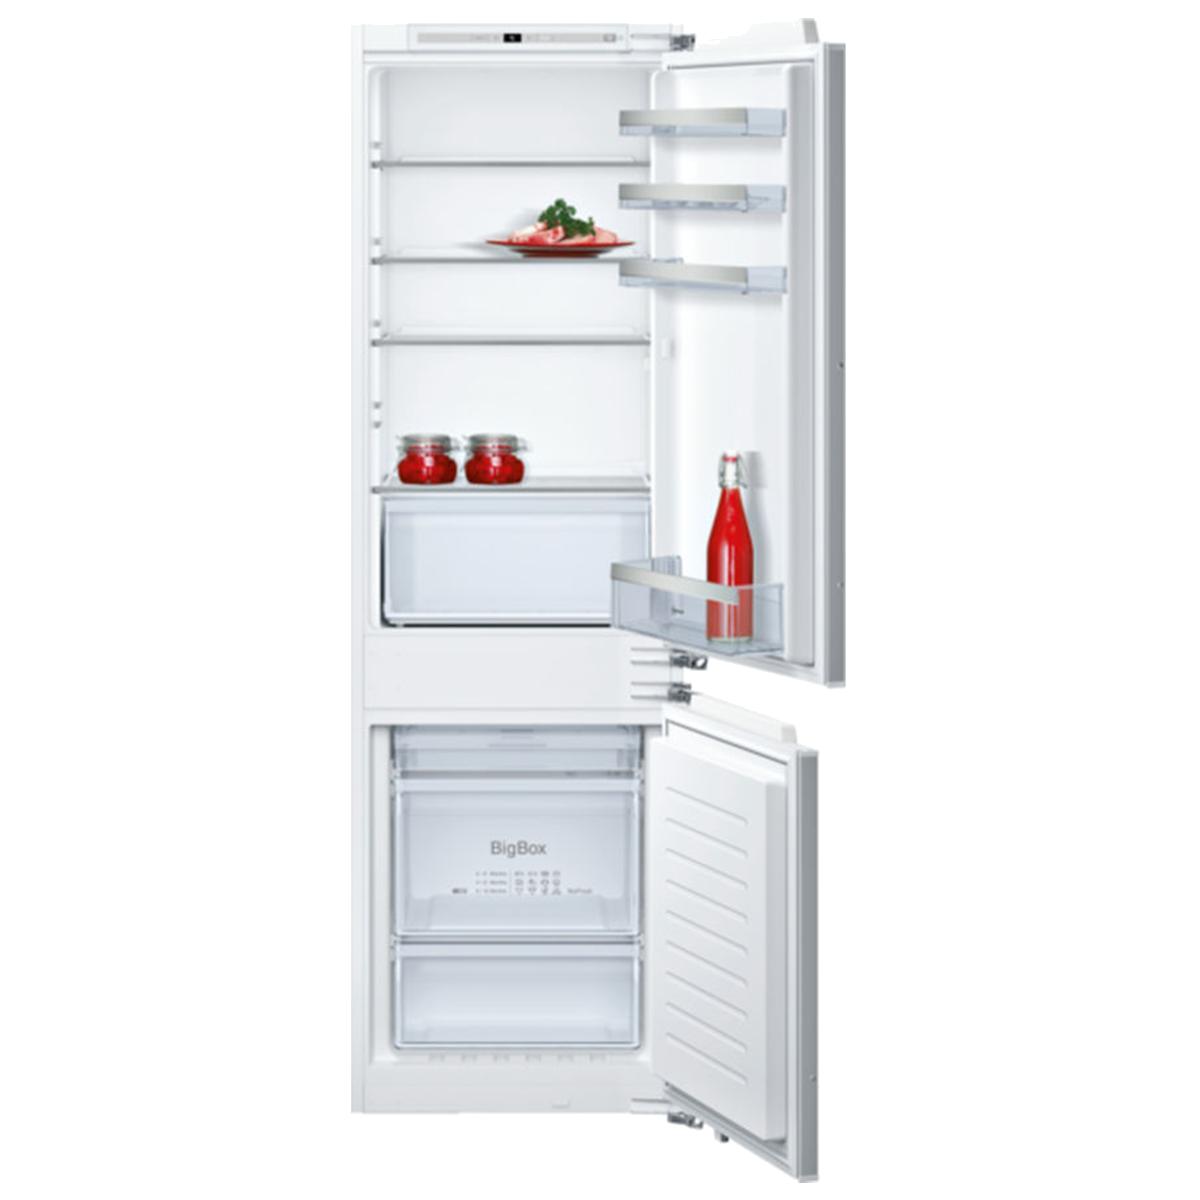 NEFF KI7862F30G, Built-In Frost Free Fridge Freezer